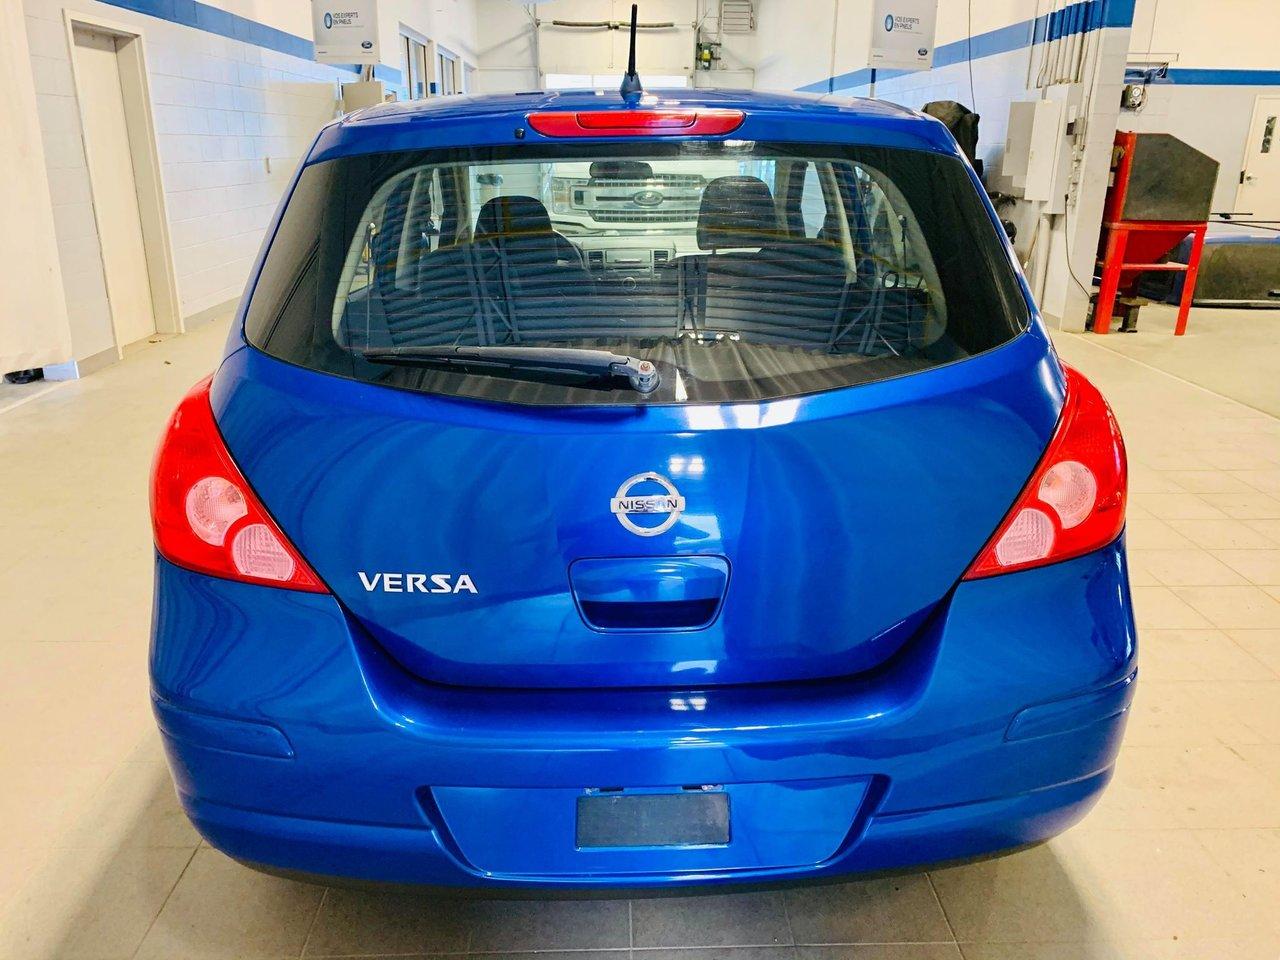 2010 Nissan Versa 5dr HB I4 Auto 1.8 S